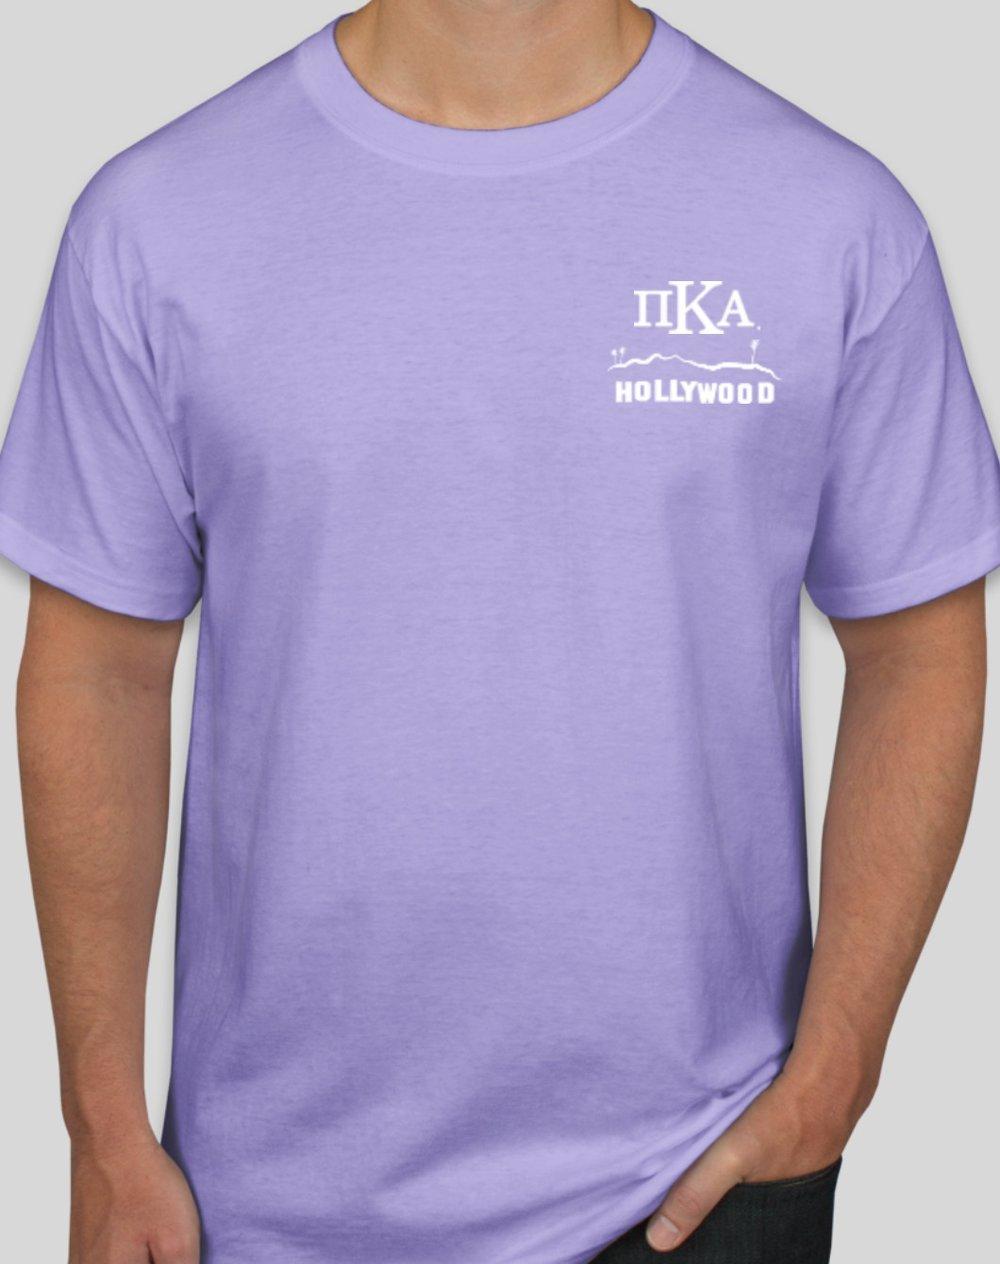 Pike Hollywood MADSS Fundraiser Tshirt (front).jpeg